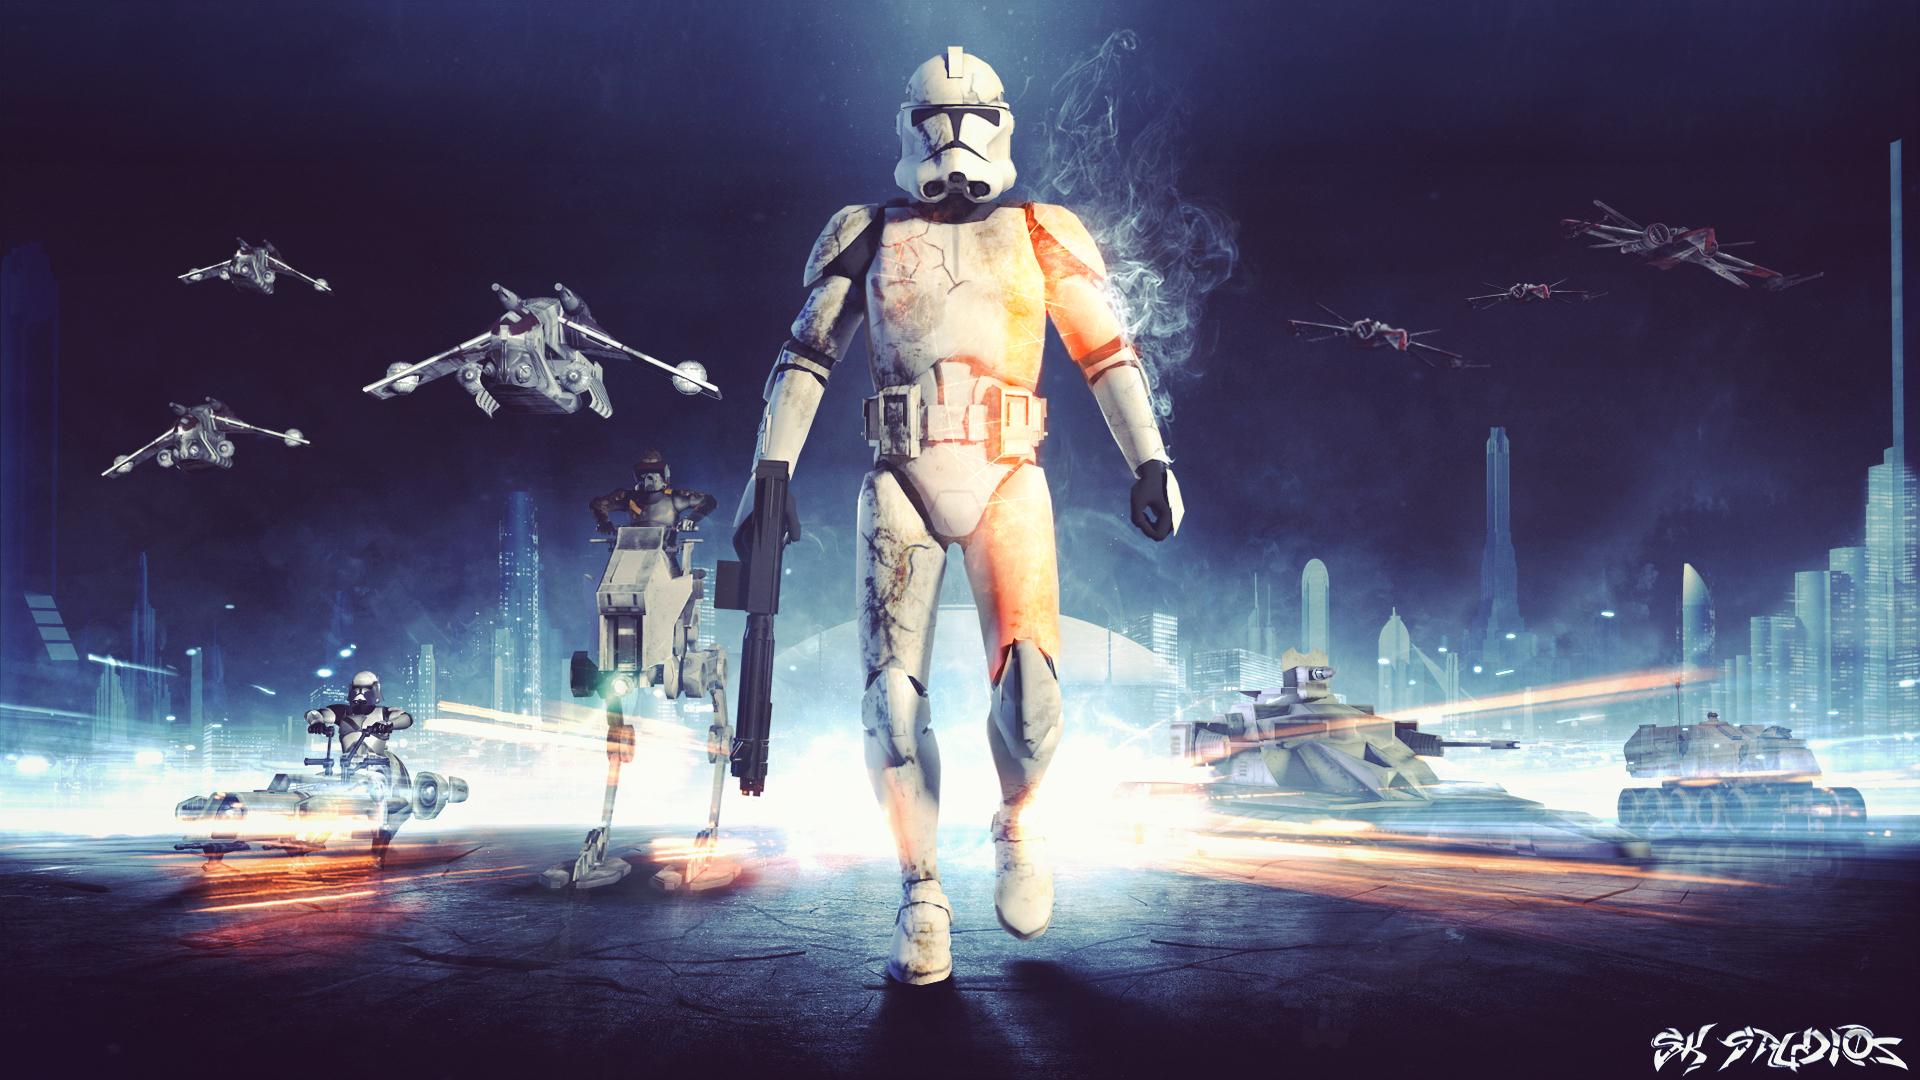 star wars battlefront (bf3 edition) republic image - arek15arekde